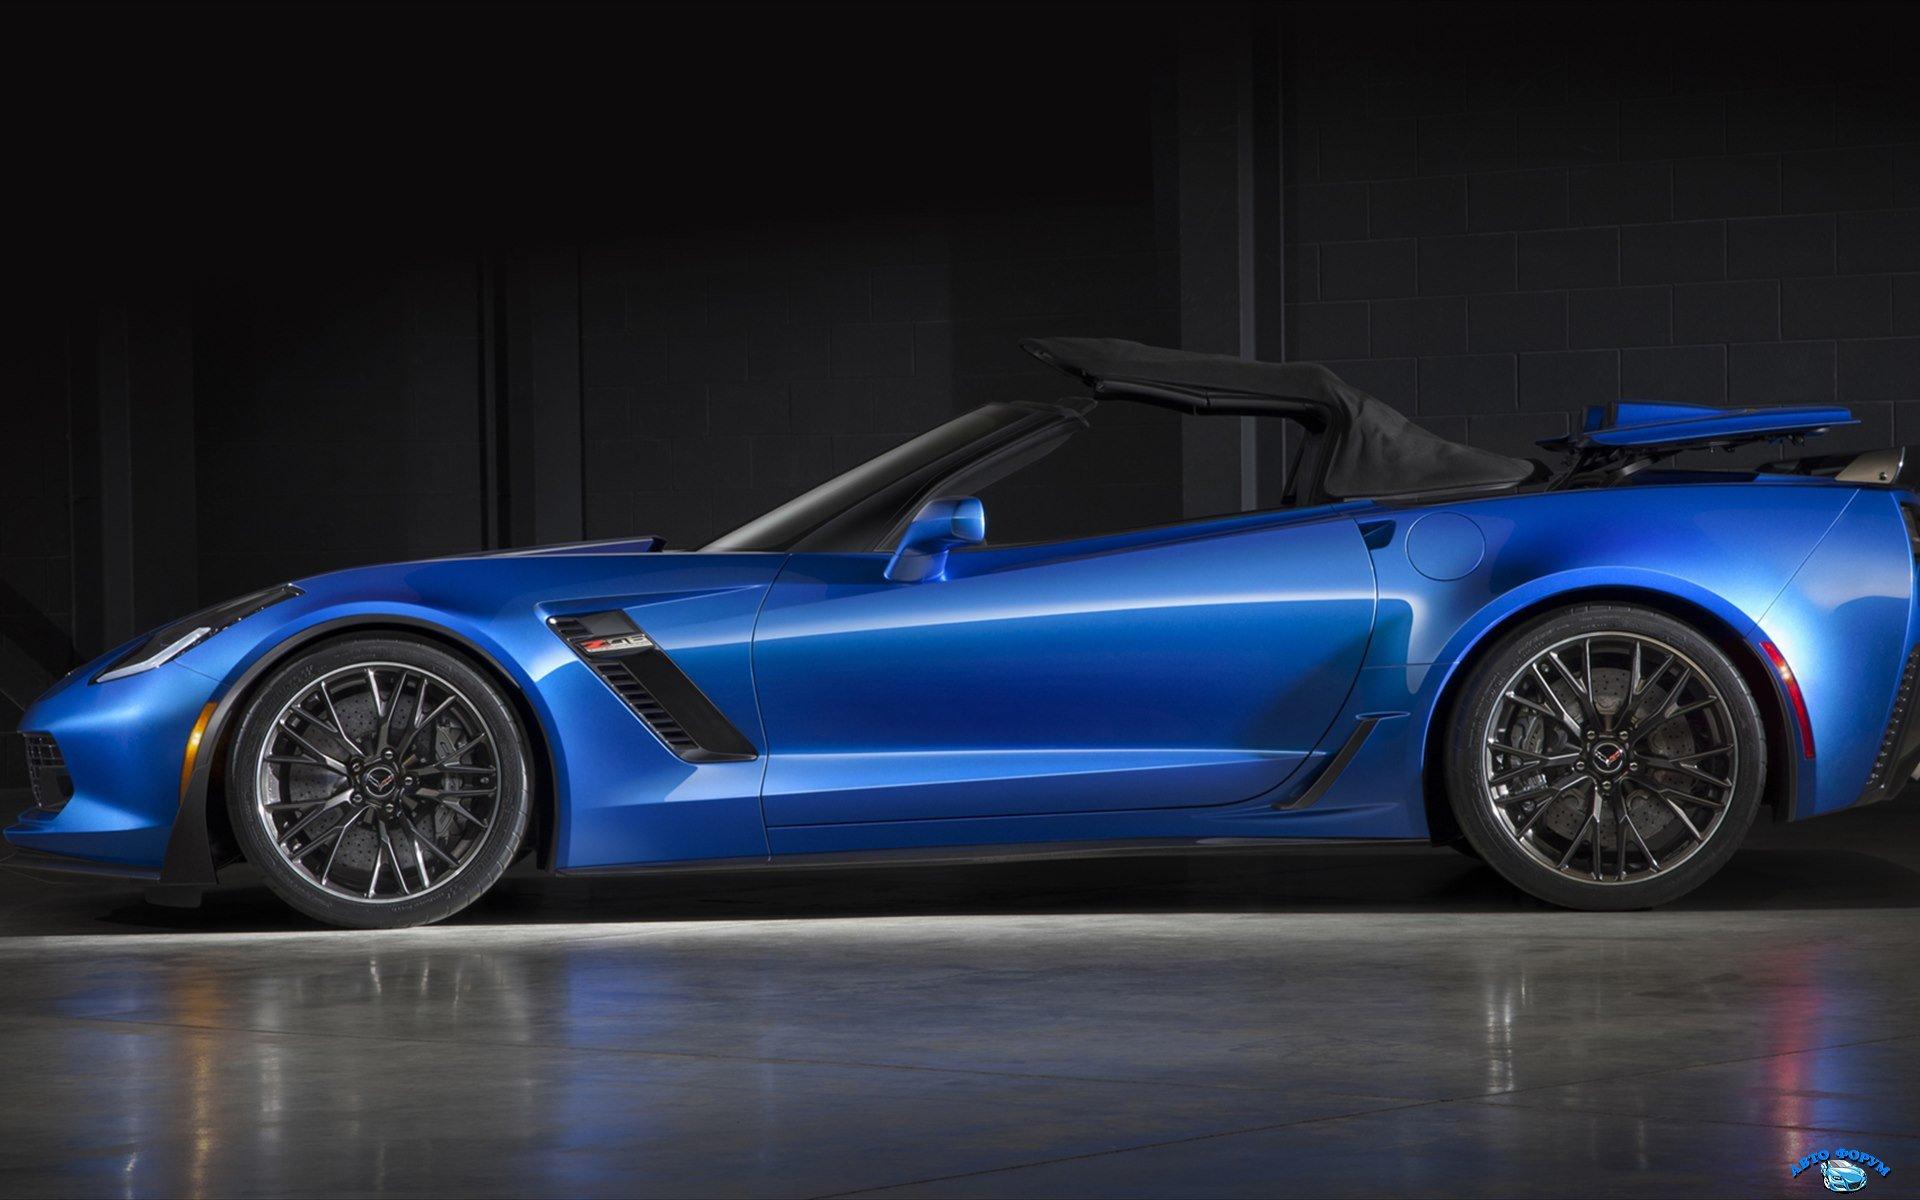 Chevrolet-Corvette-Z06-Convertible-2015-widescreen-11.jpg